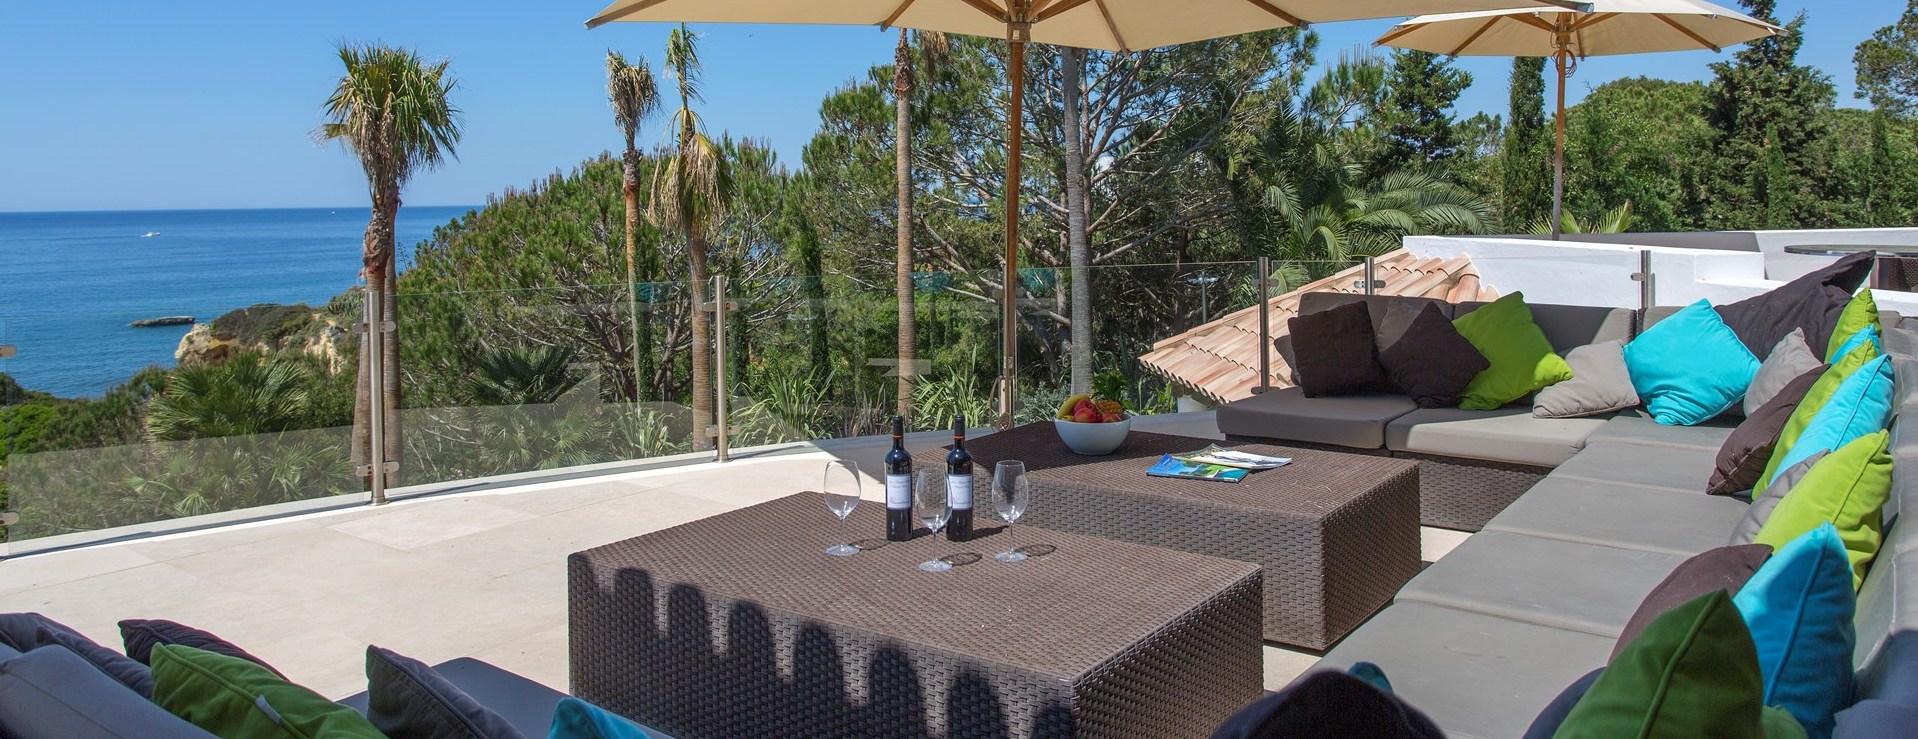 villa-balbina-seaview-terrace-lounge